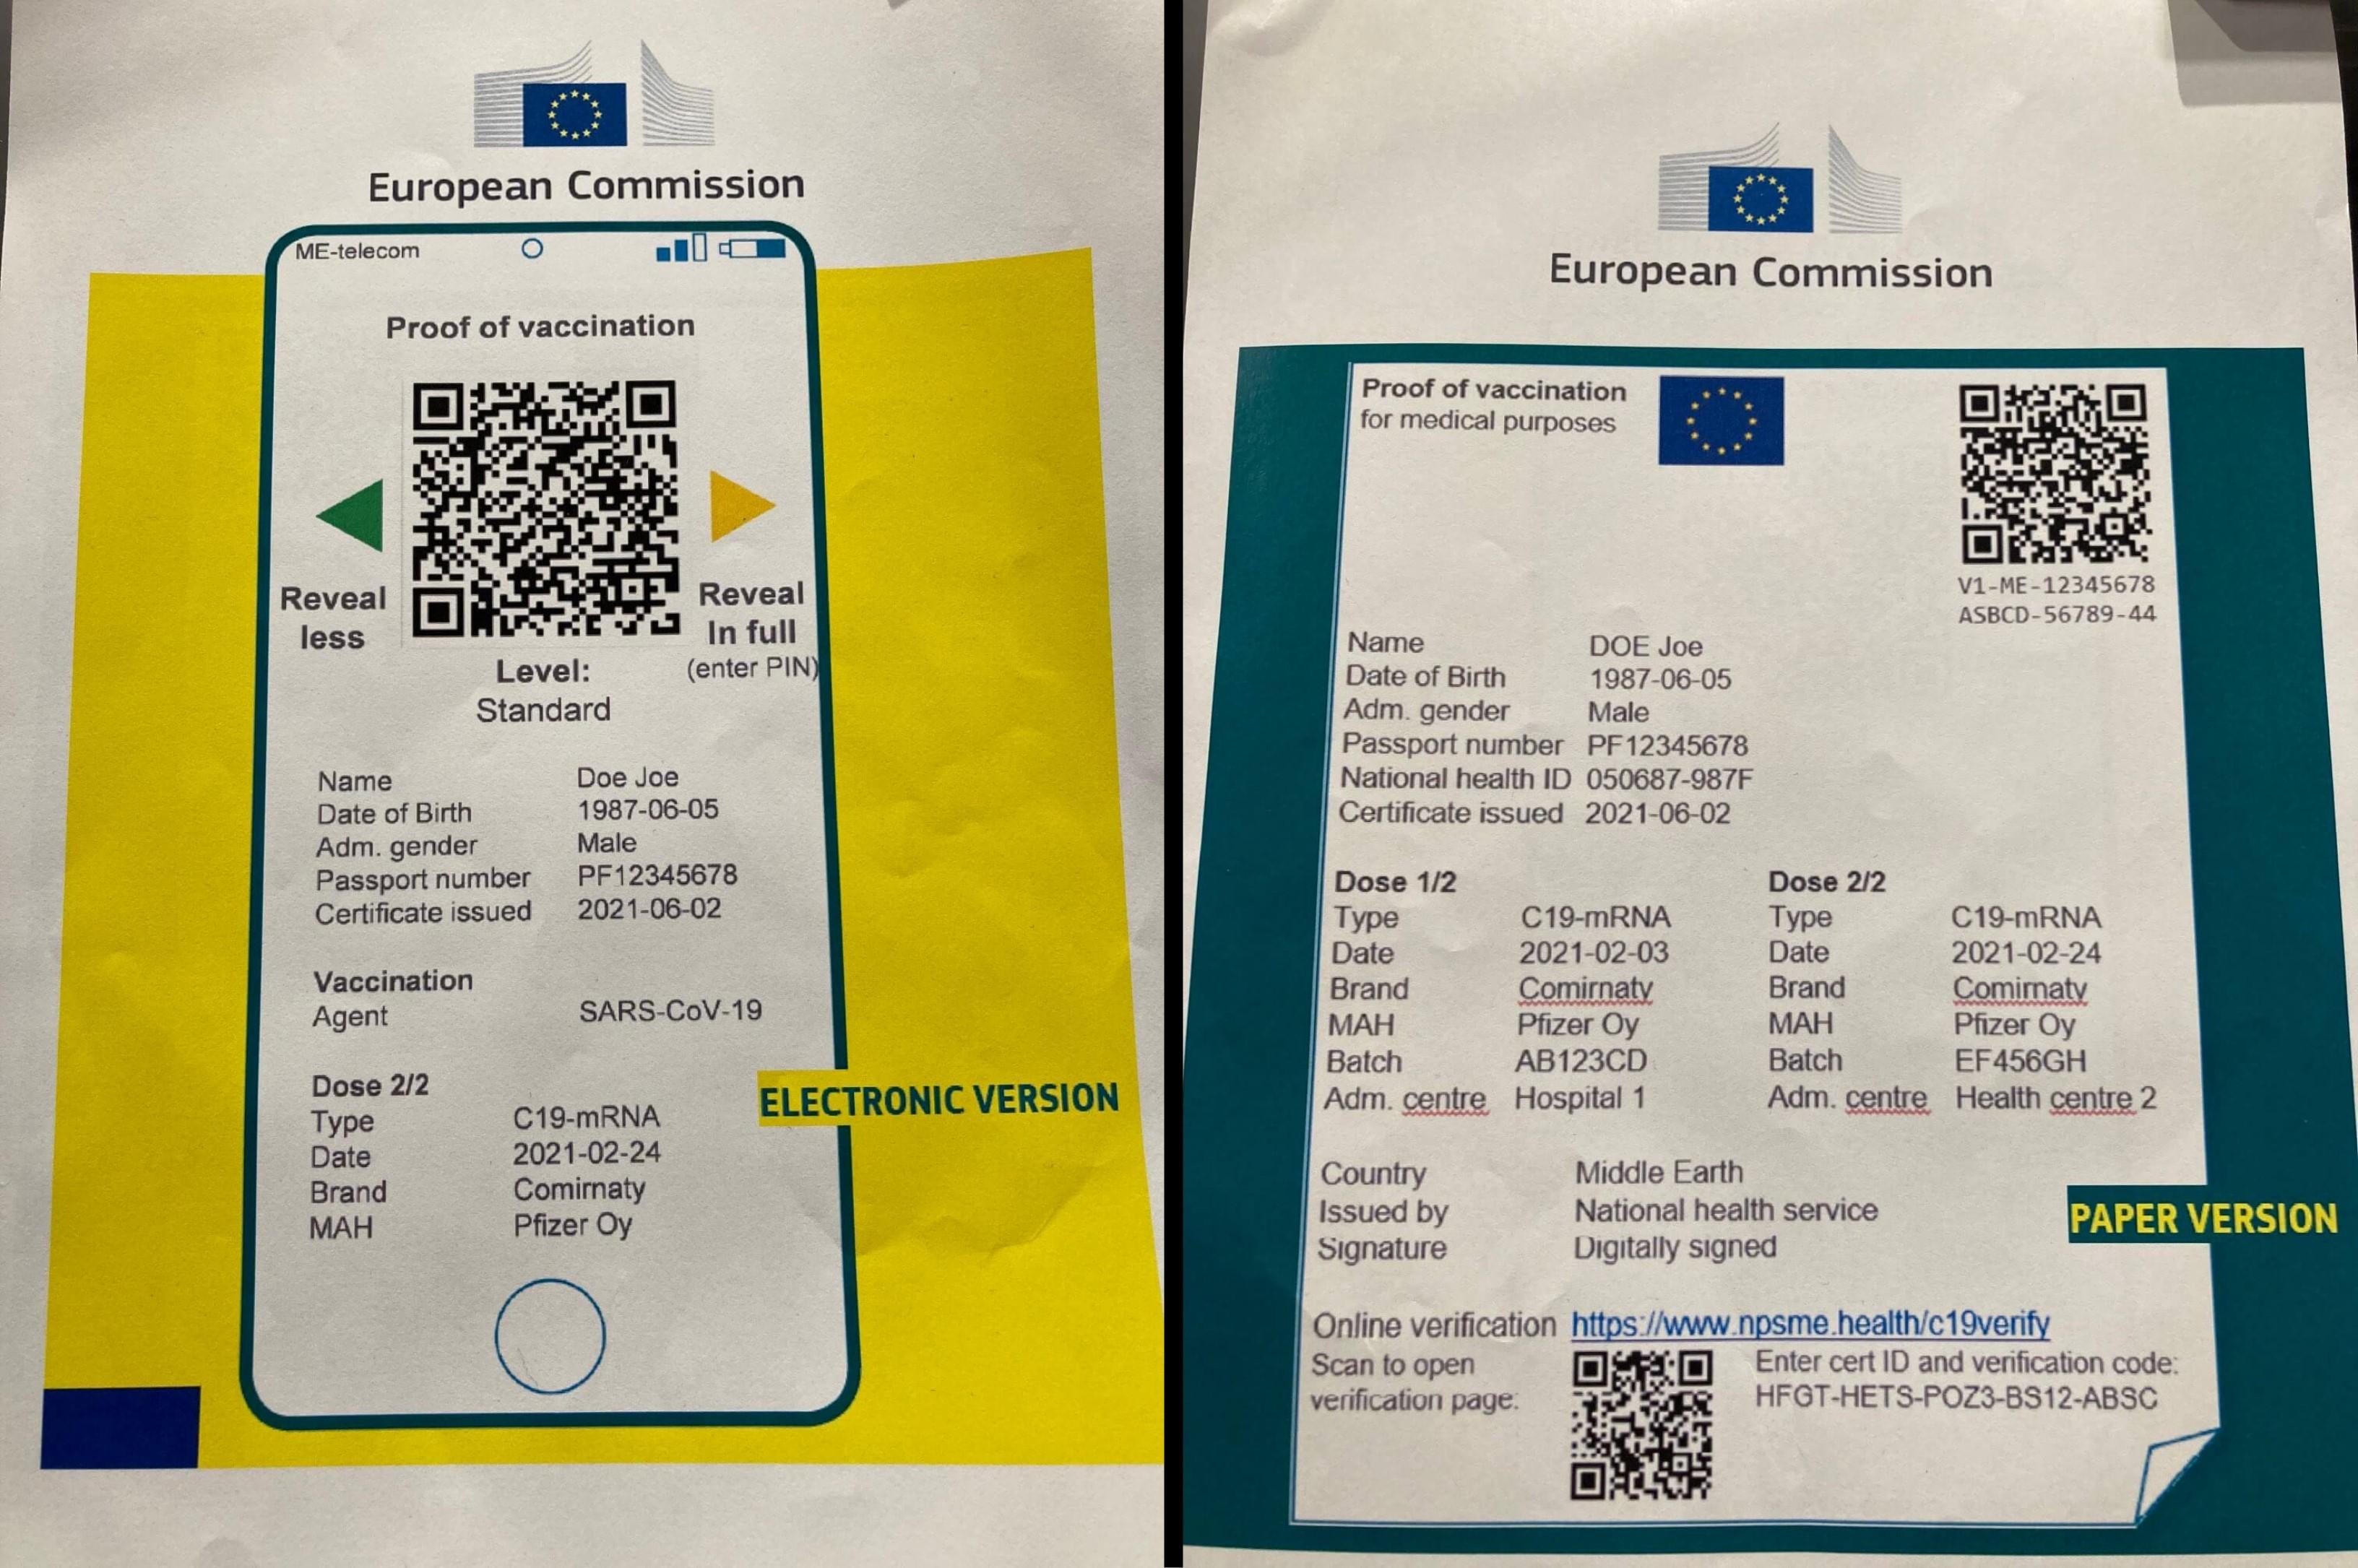 Vaccine Passport EU 2021 - Everything You Need To Know ...